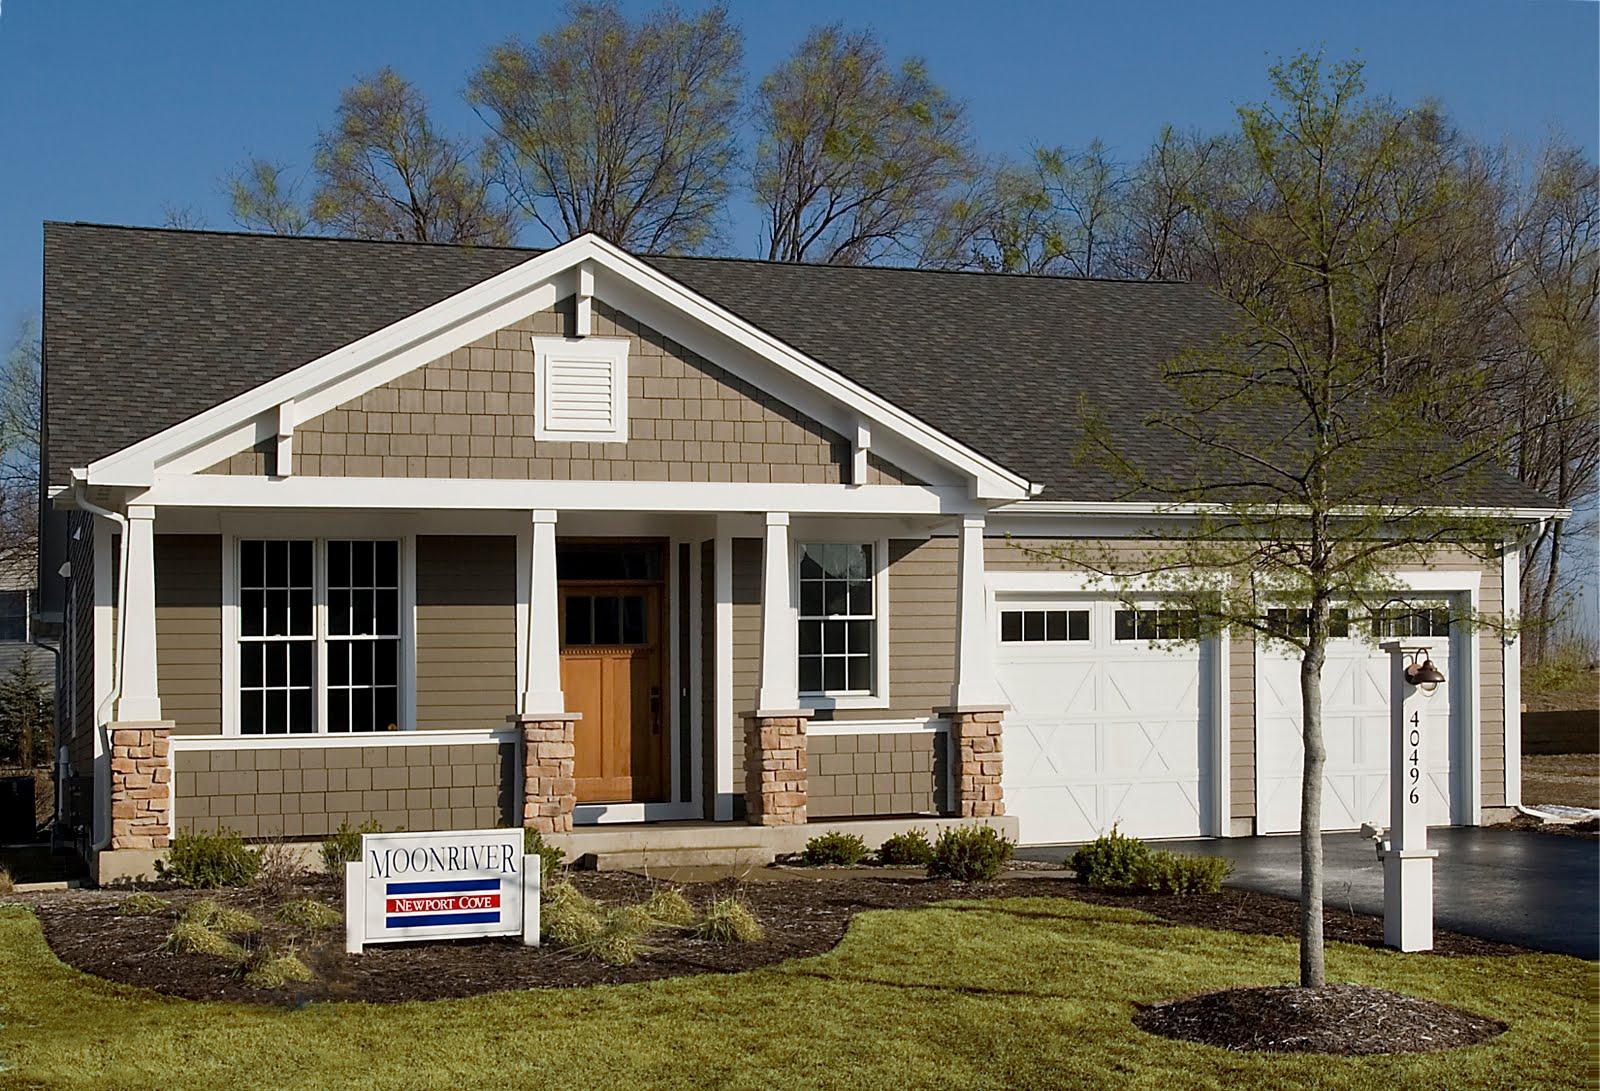 House design near river - Home Design Styles